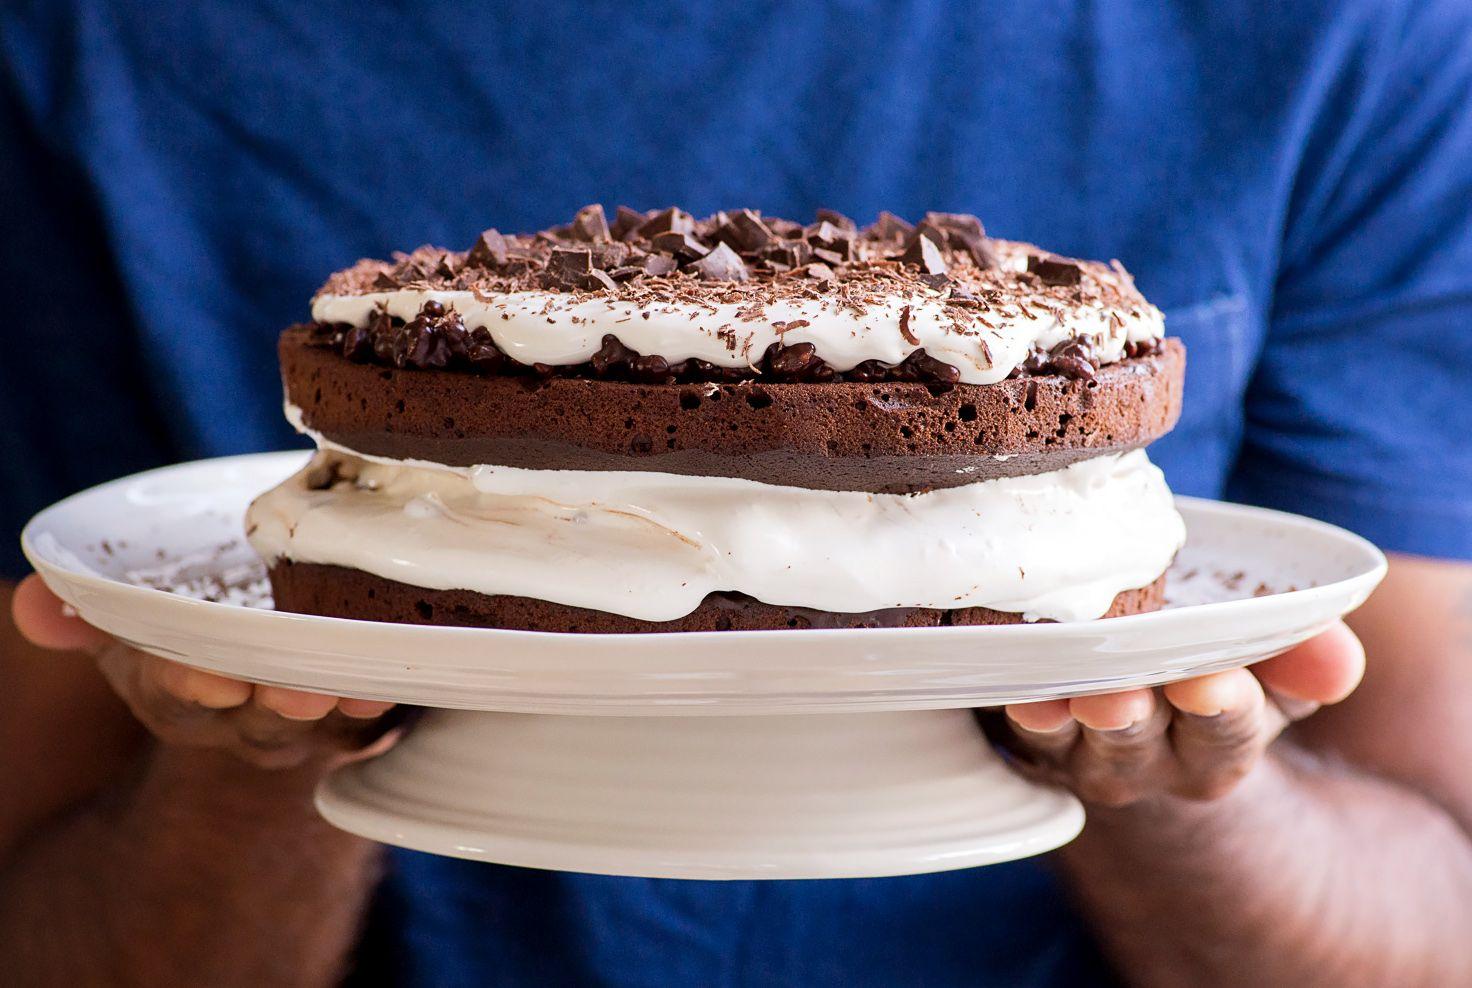 Jamie olivers chocolate celebration cake with puffed rice